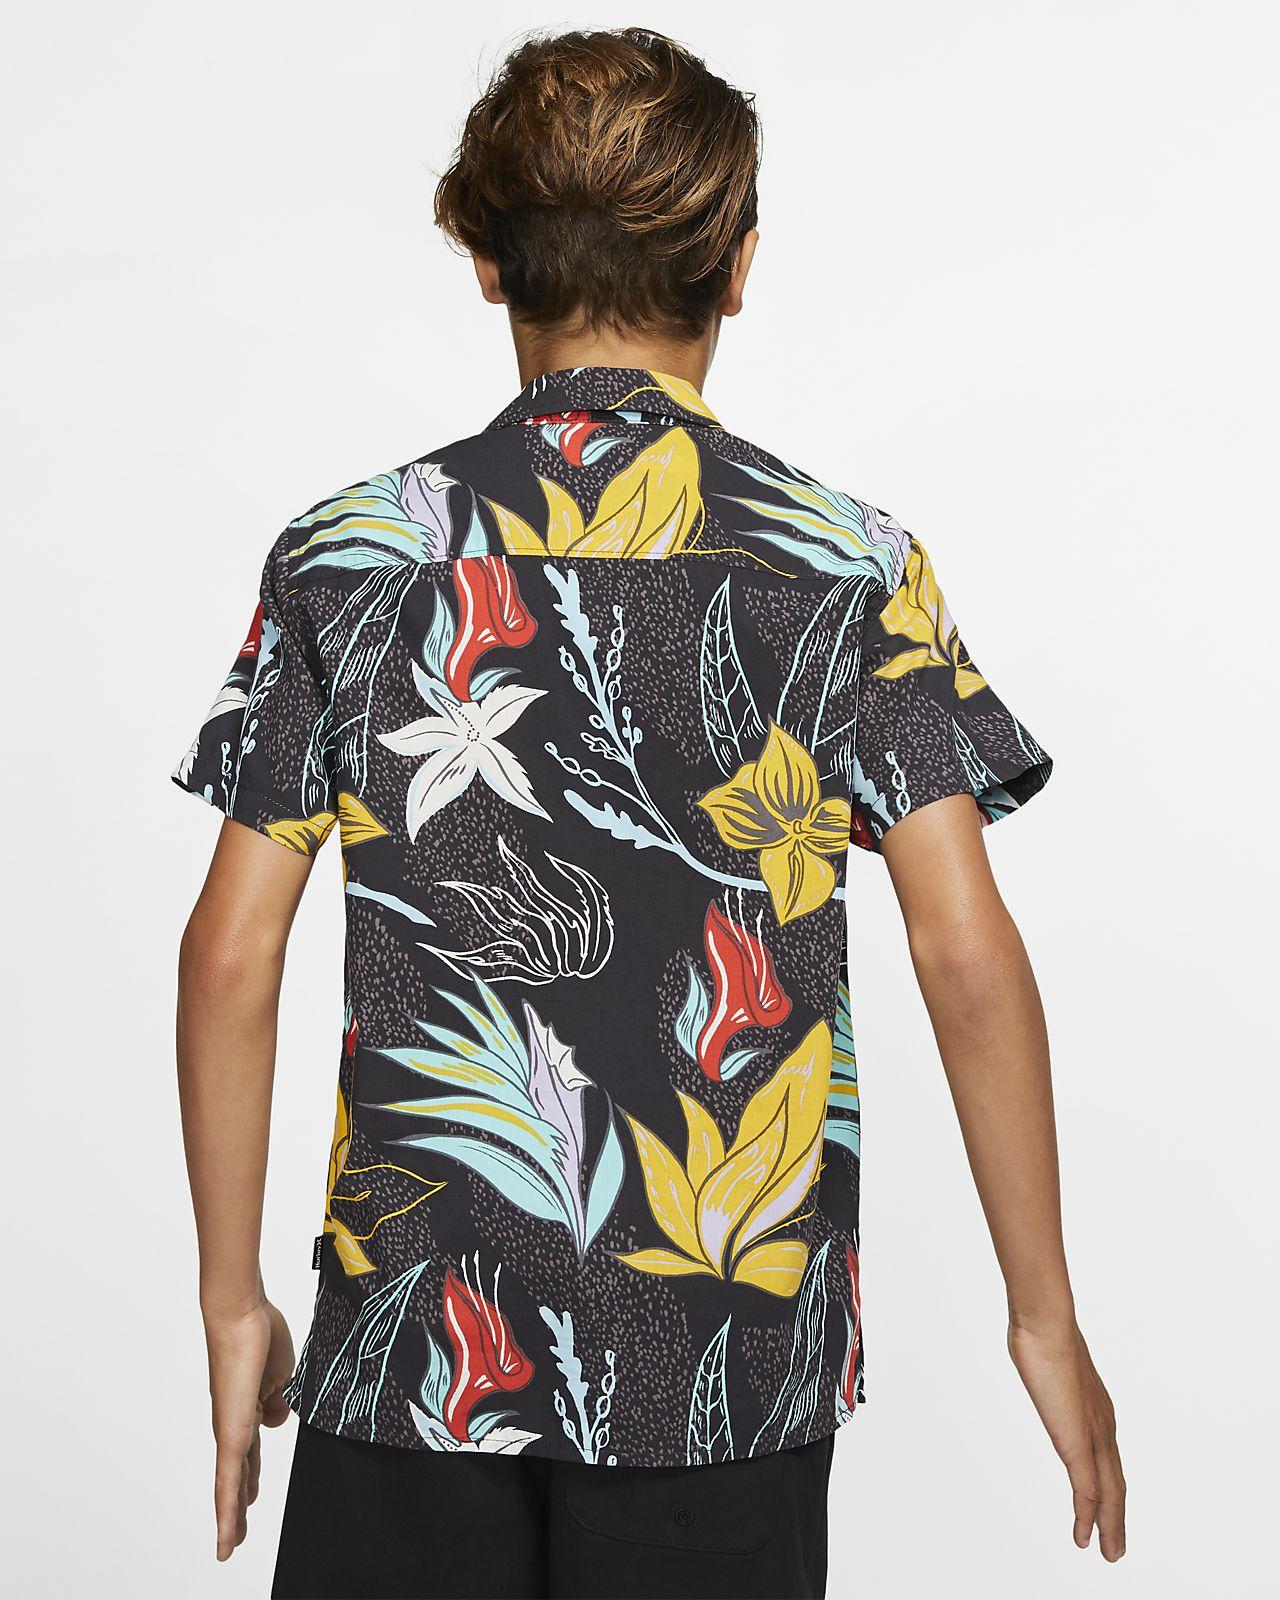 Hurley Domino Boys' Short-Sleeve Shirt